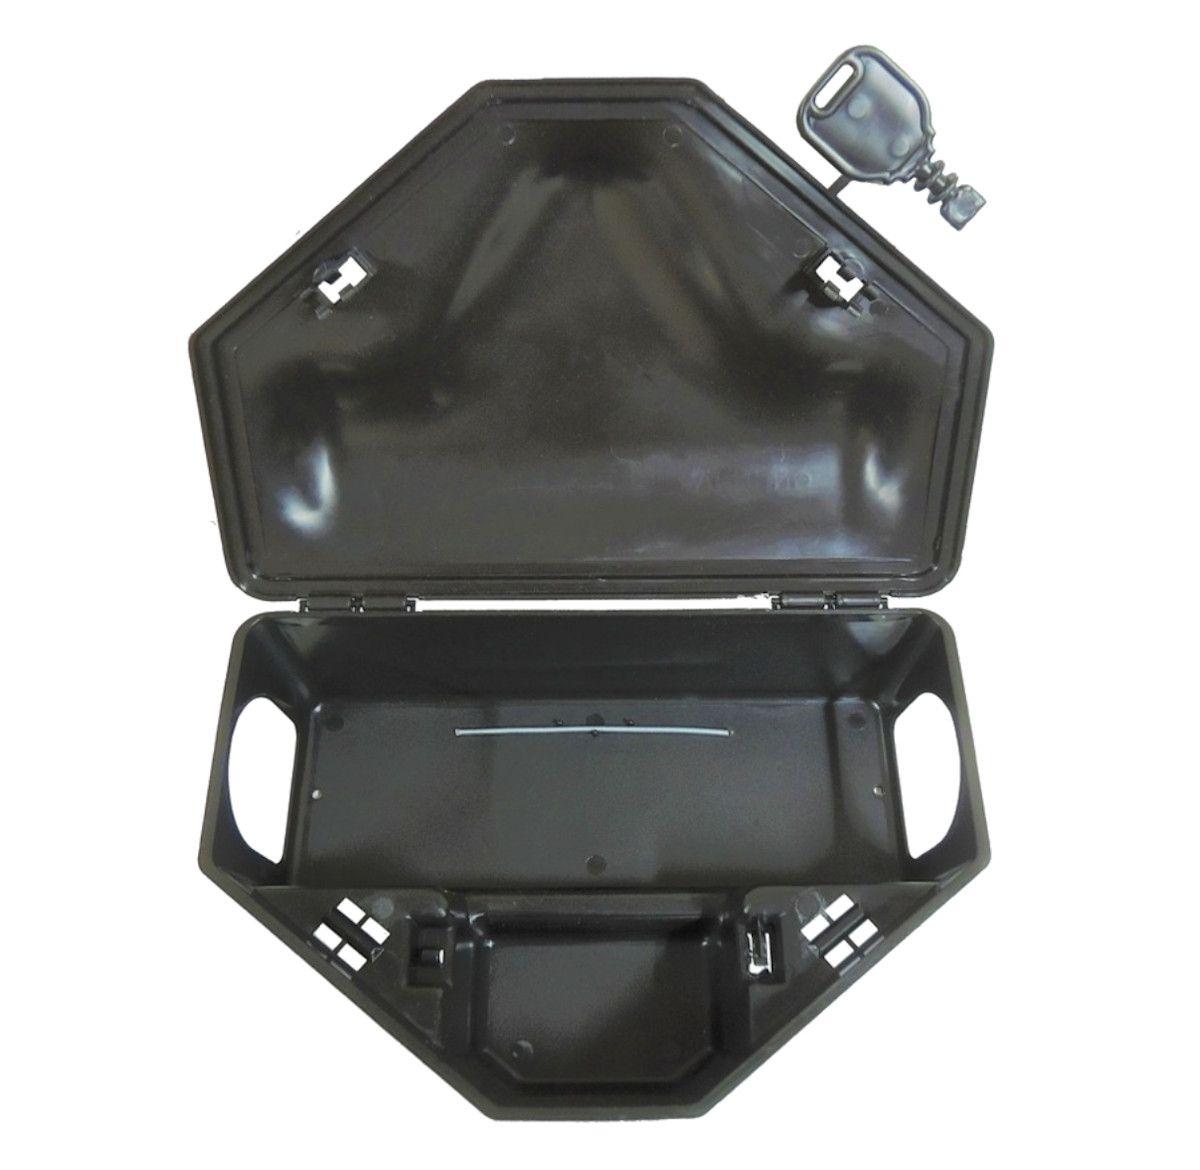 Kit 64 Porta Isca Com 2 Chaves - Duplo Travamento